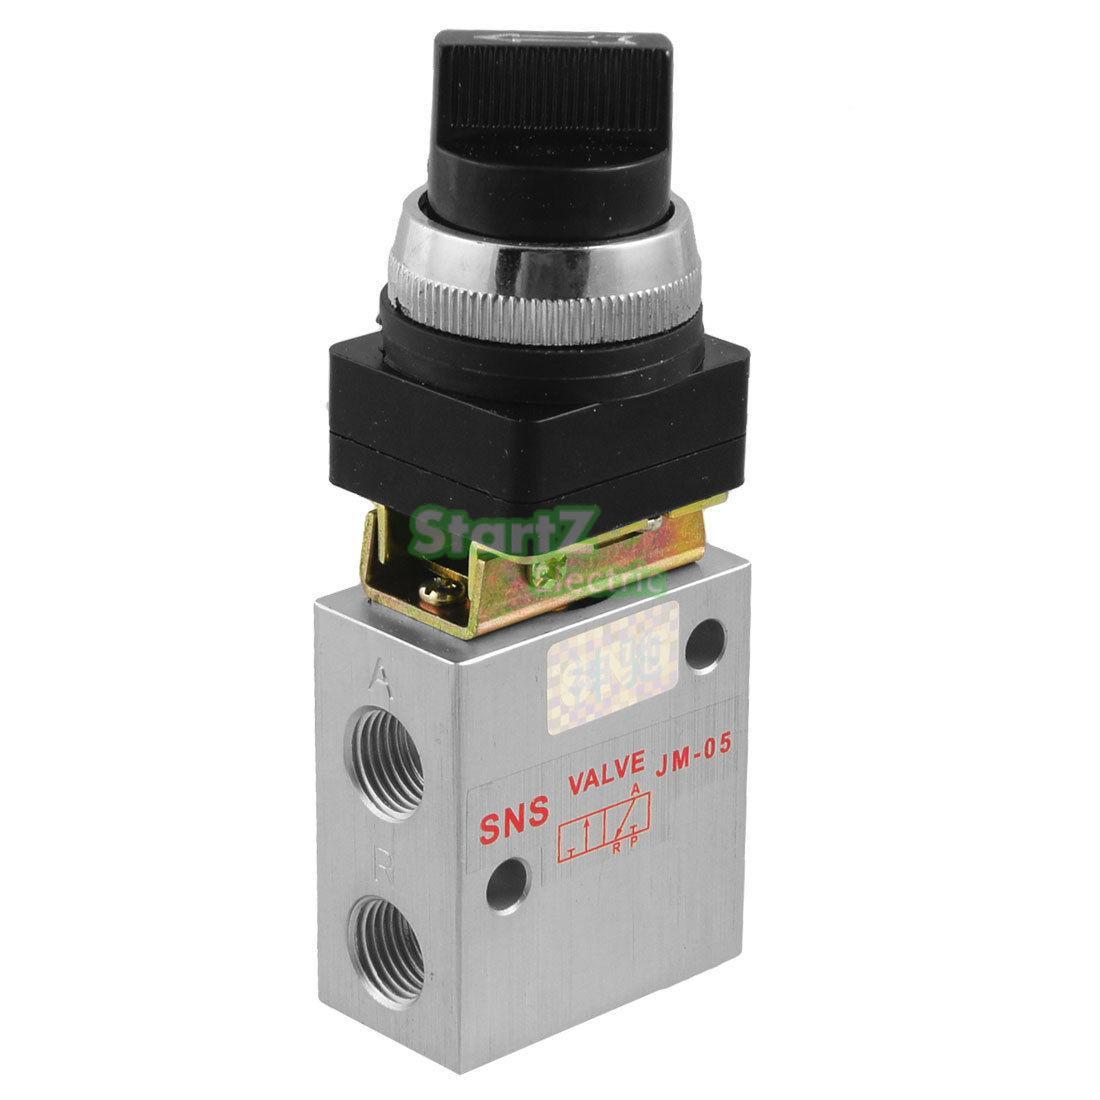 Pneumatic switch JM-05 2 Position 3 Way Selective Knob Type Mechanical ValvePneumatic switch JM-05 2 Position 3 Way Selective Knob Type Mechanical Valve